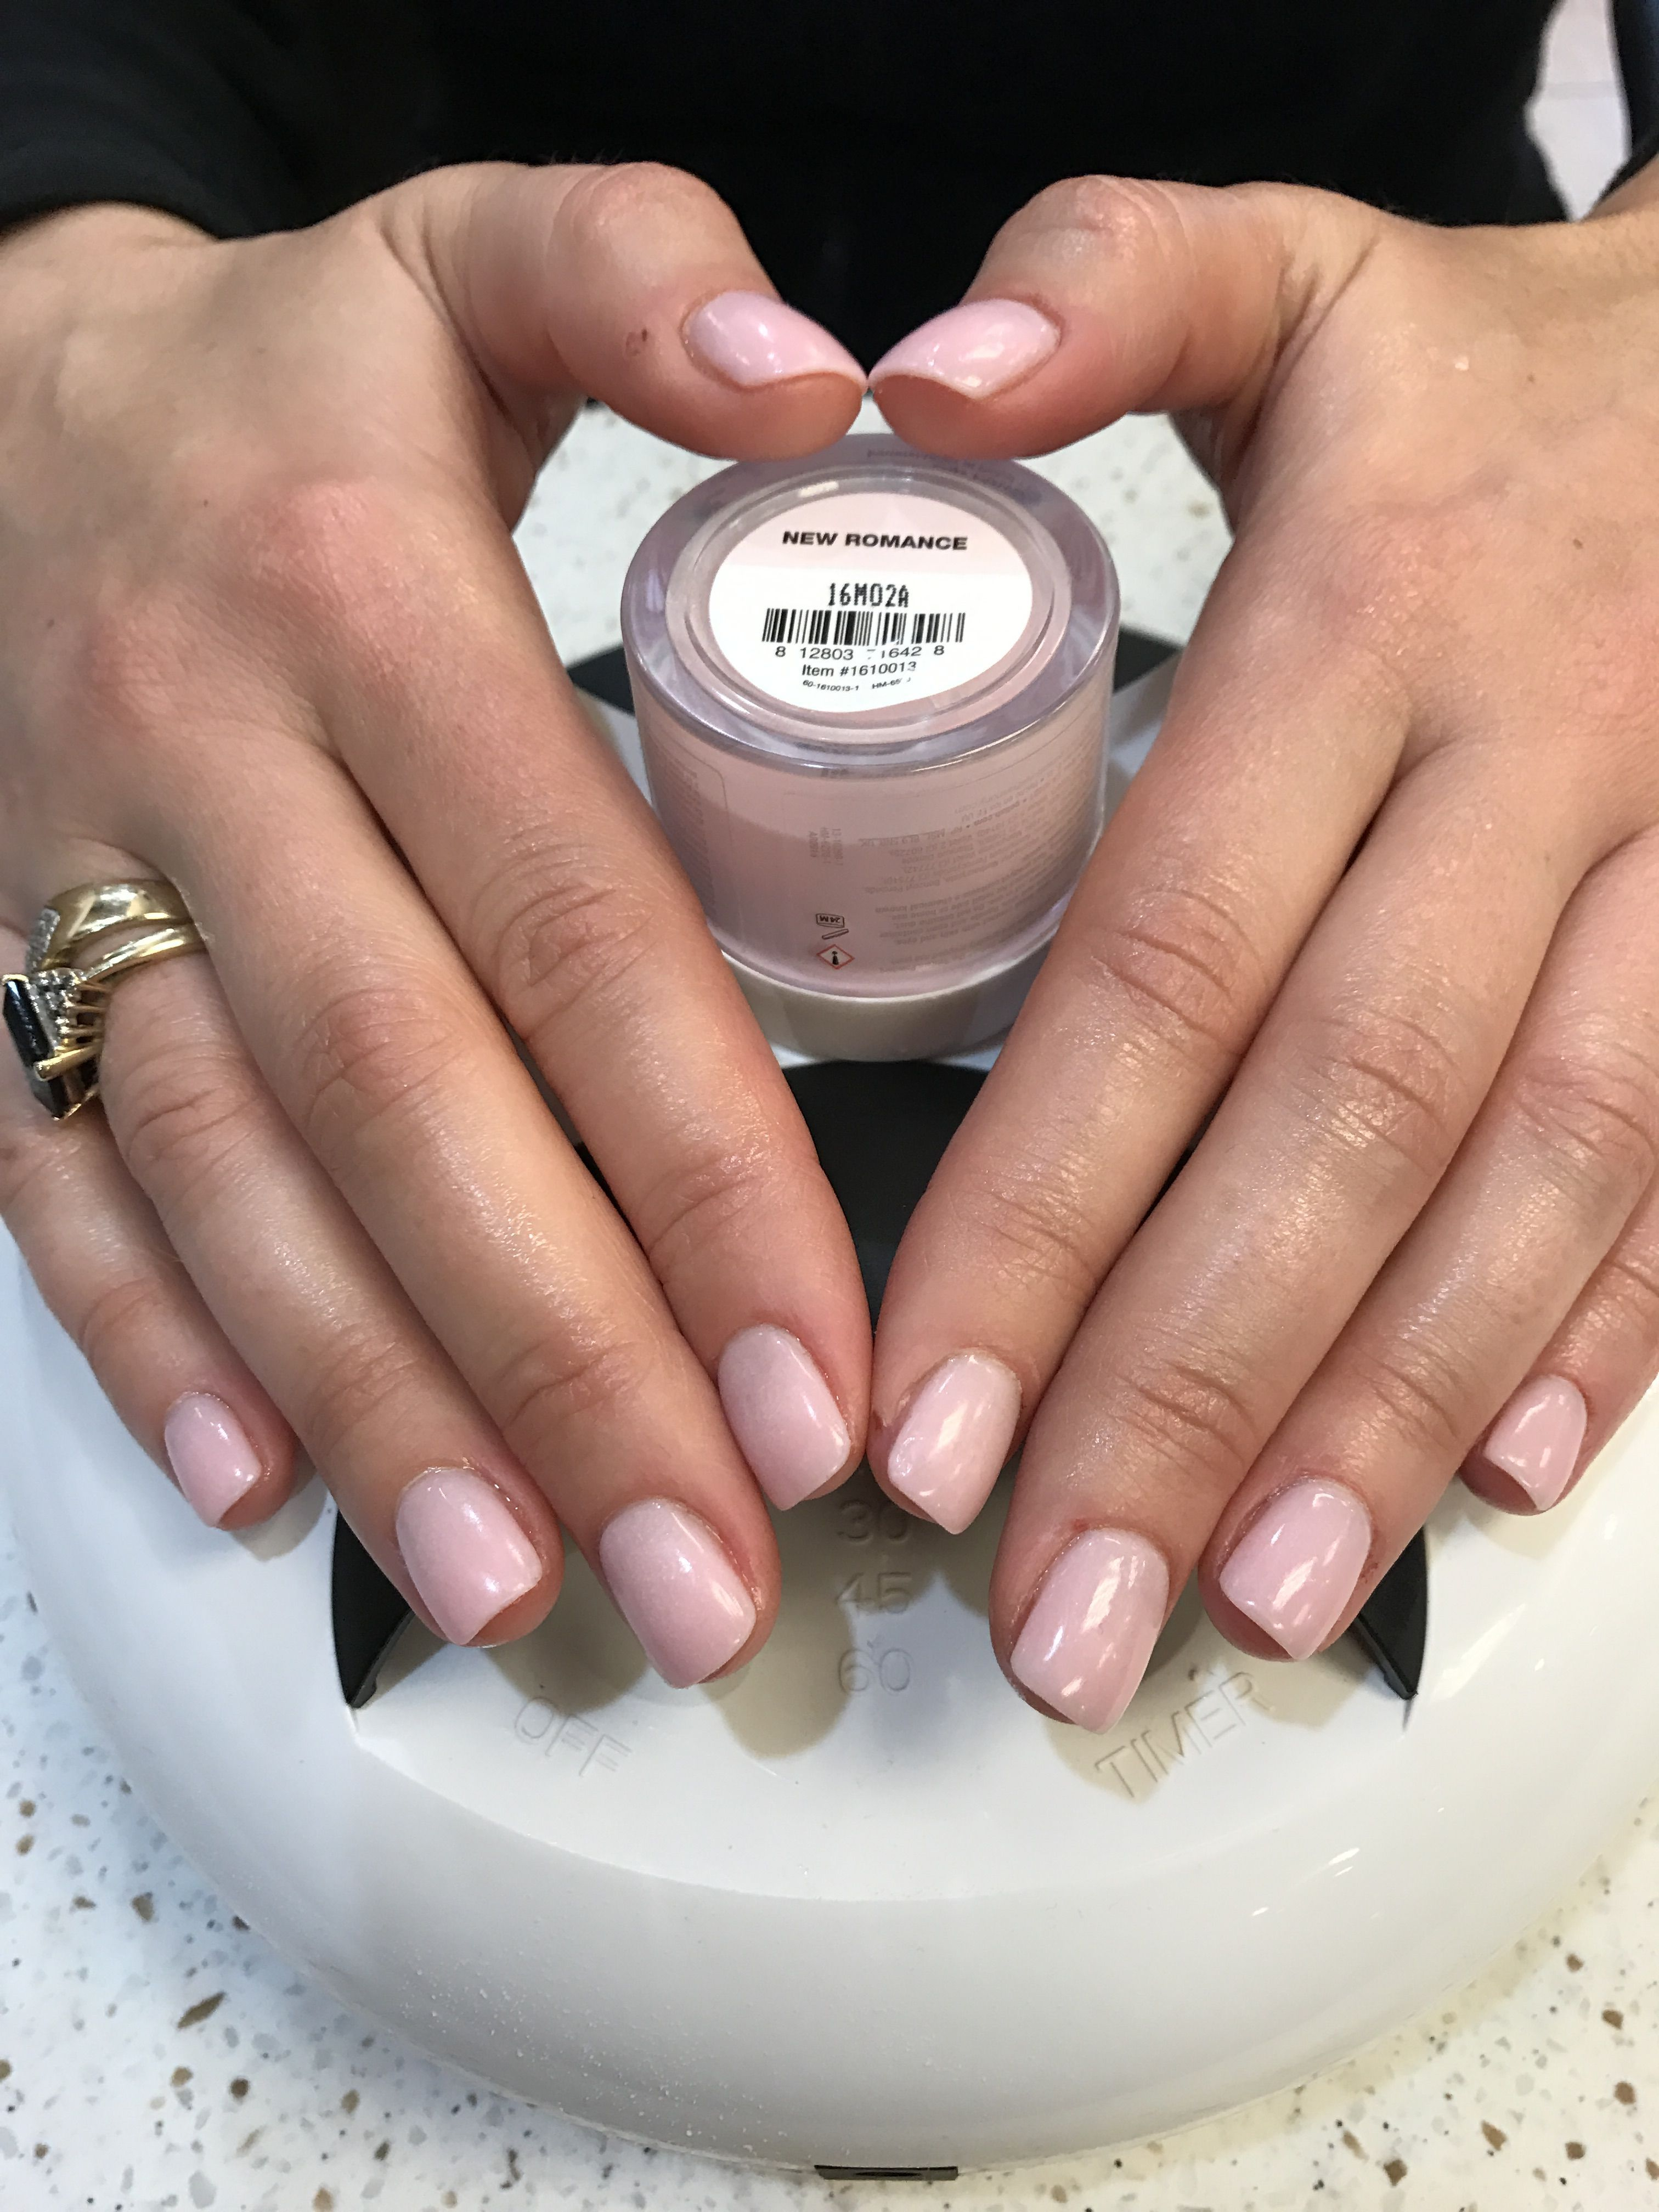 How To Remove Nail Dips Gel Powder Polish My Tips Health Nails In 2019 Gel Powder Nails